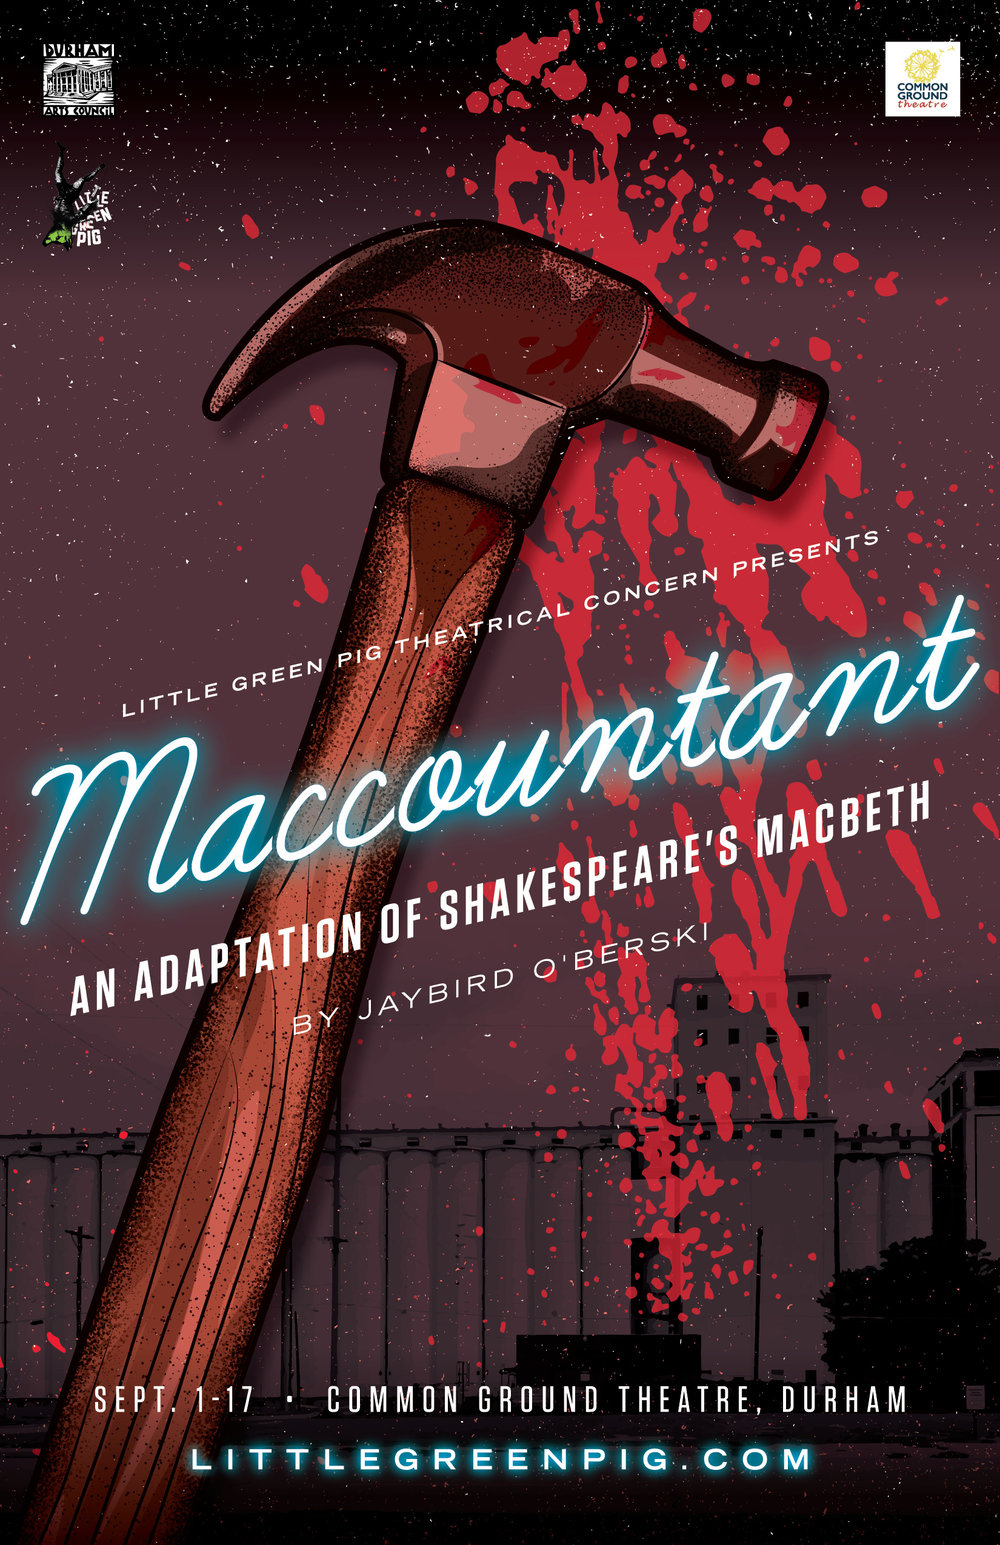 Maccountant Poster.jpg